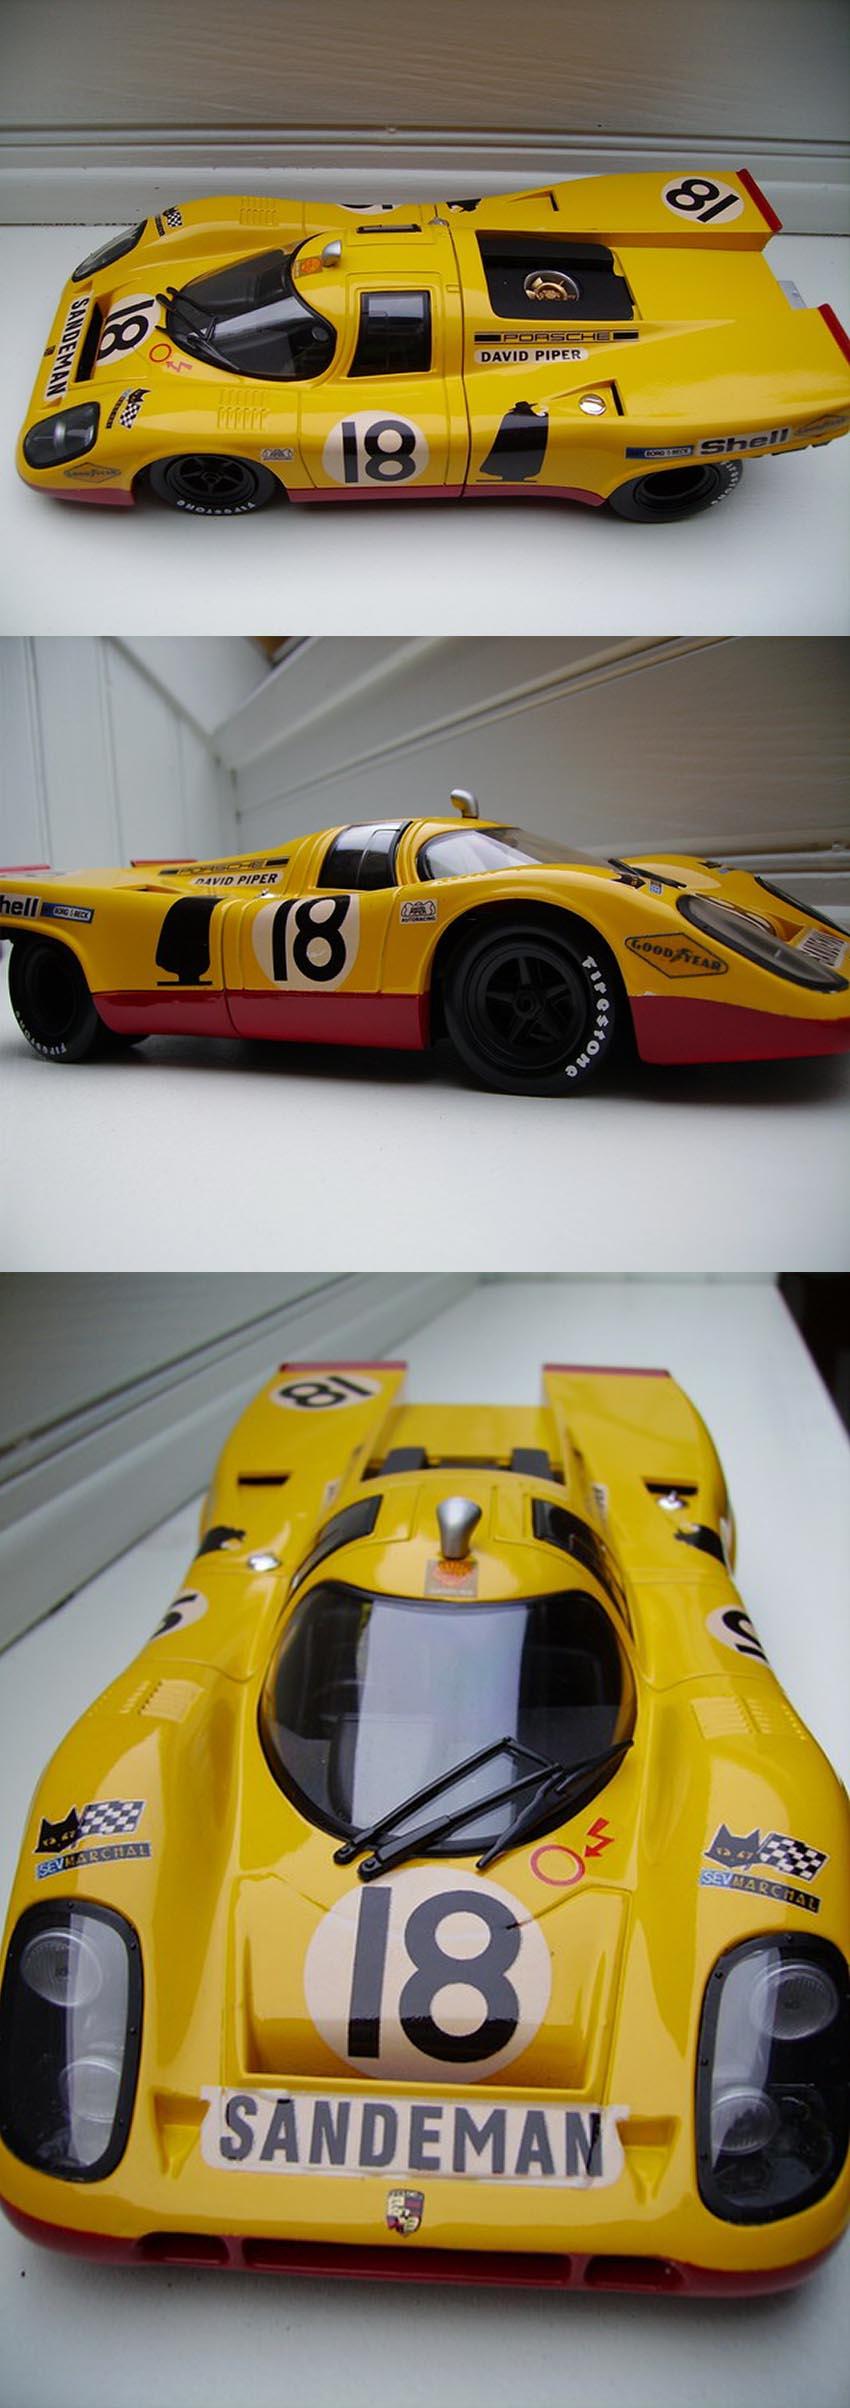 Calcas Lola T70 MkIII Le Mans 1968 1:32 1:43 1:24 1:18 64 87 slot decals